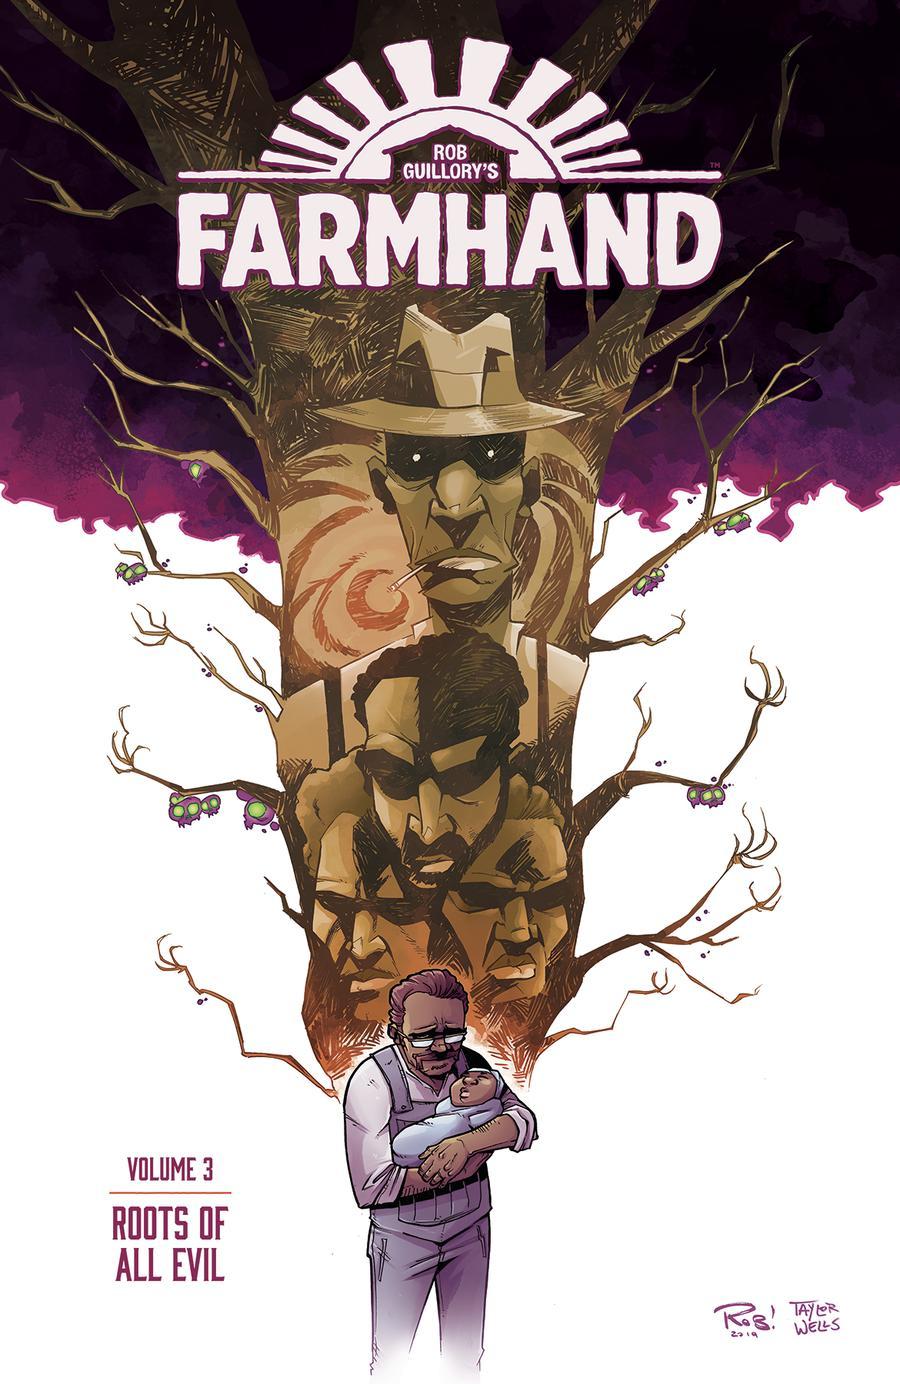 Farmhand Vol 3 Roots Of All Evil TP